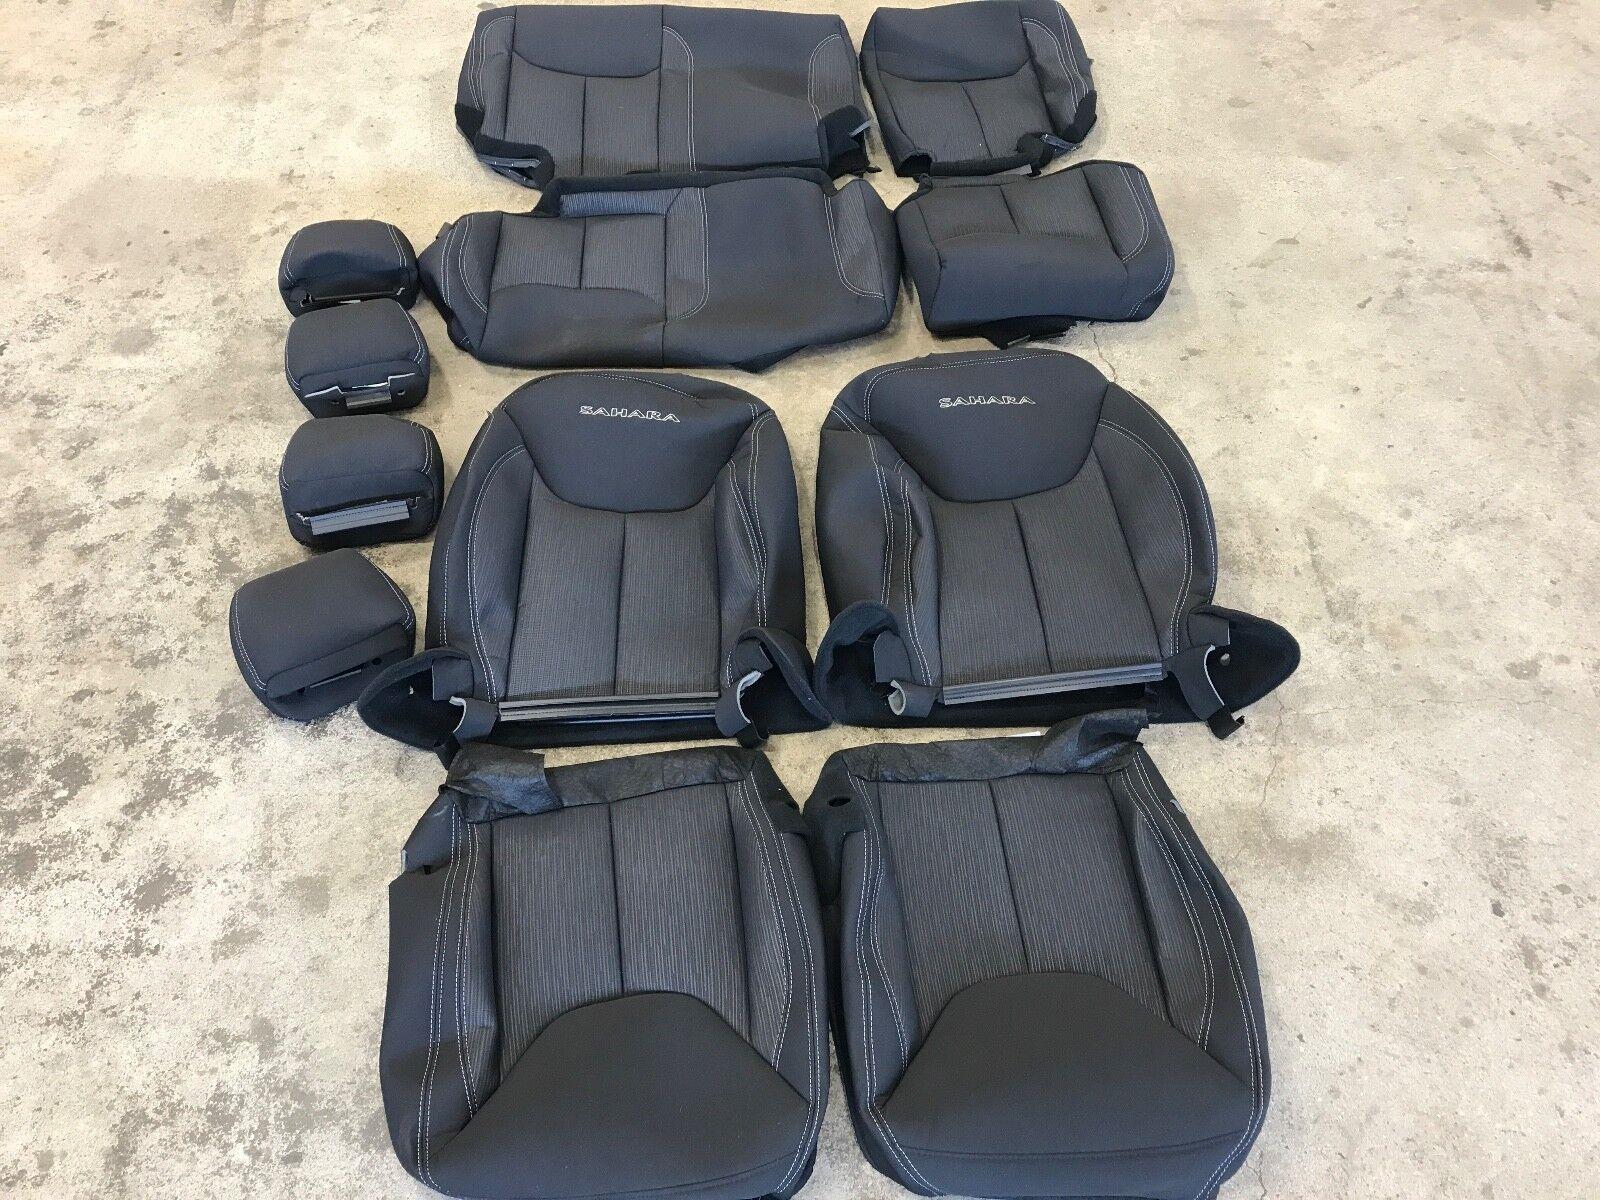 oem jeep seat covers velcromag. Black Bedroom Furniture Sets. Home Design Ideas